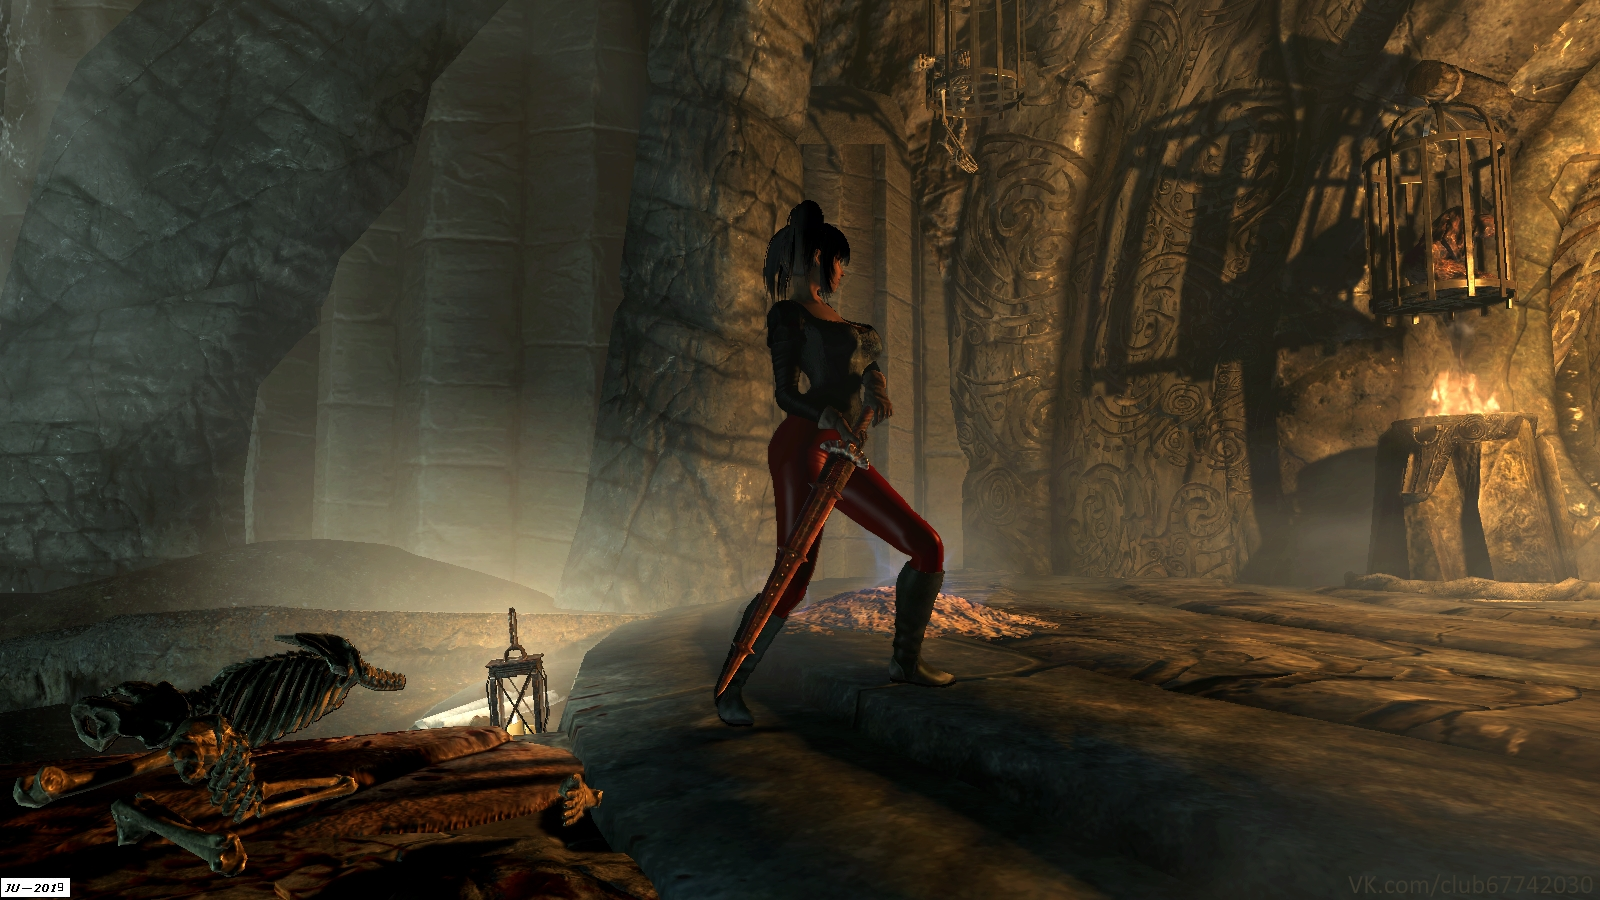 Курган Бладскал. - Elder Scrolls 5: Skyrim, the Солстейм